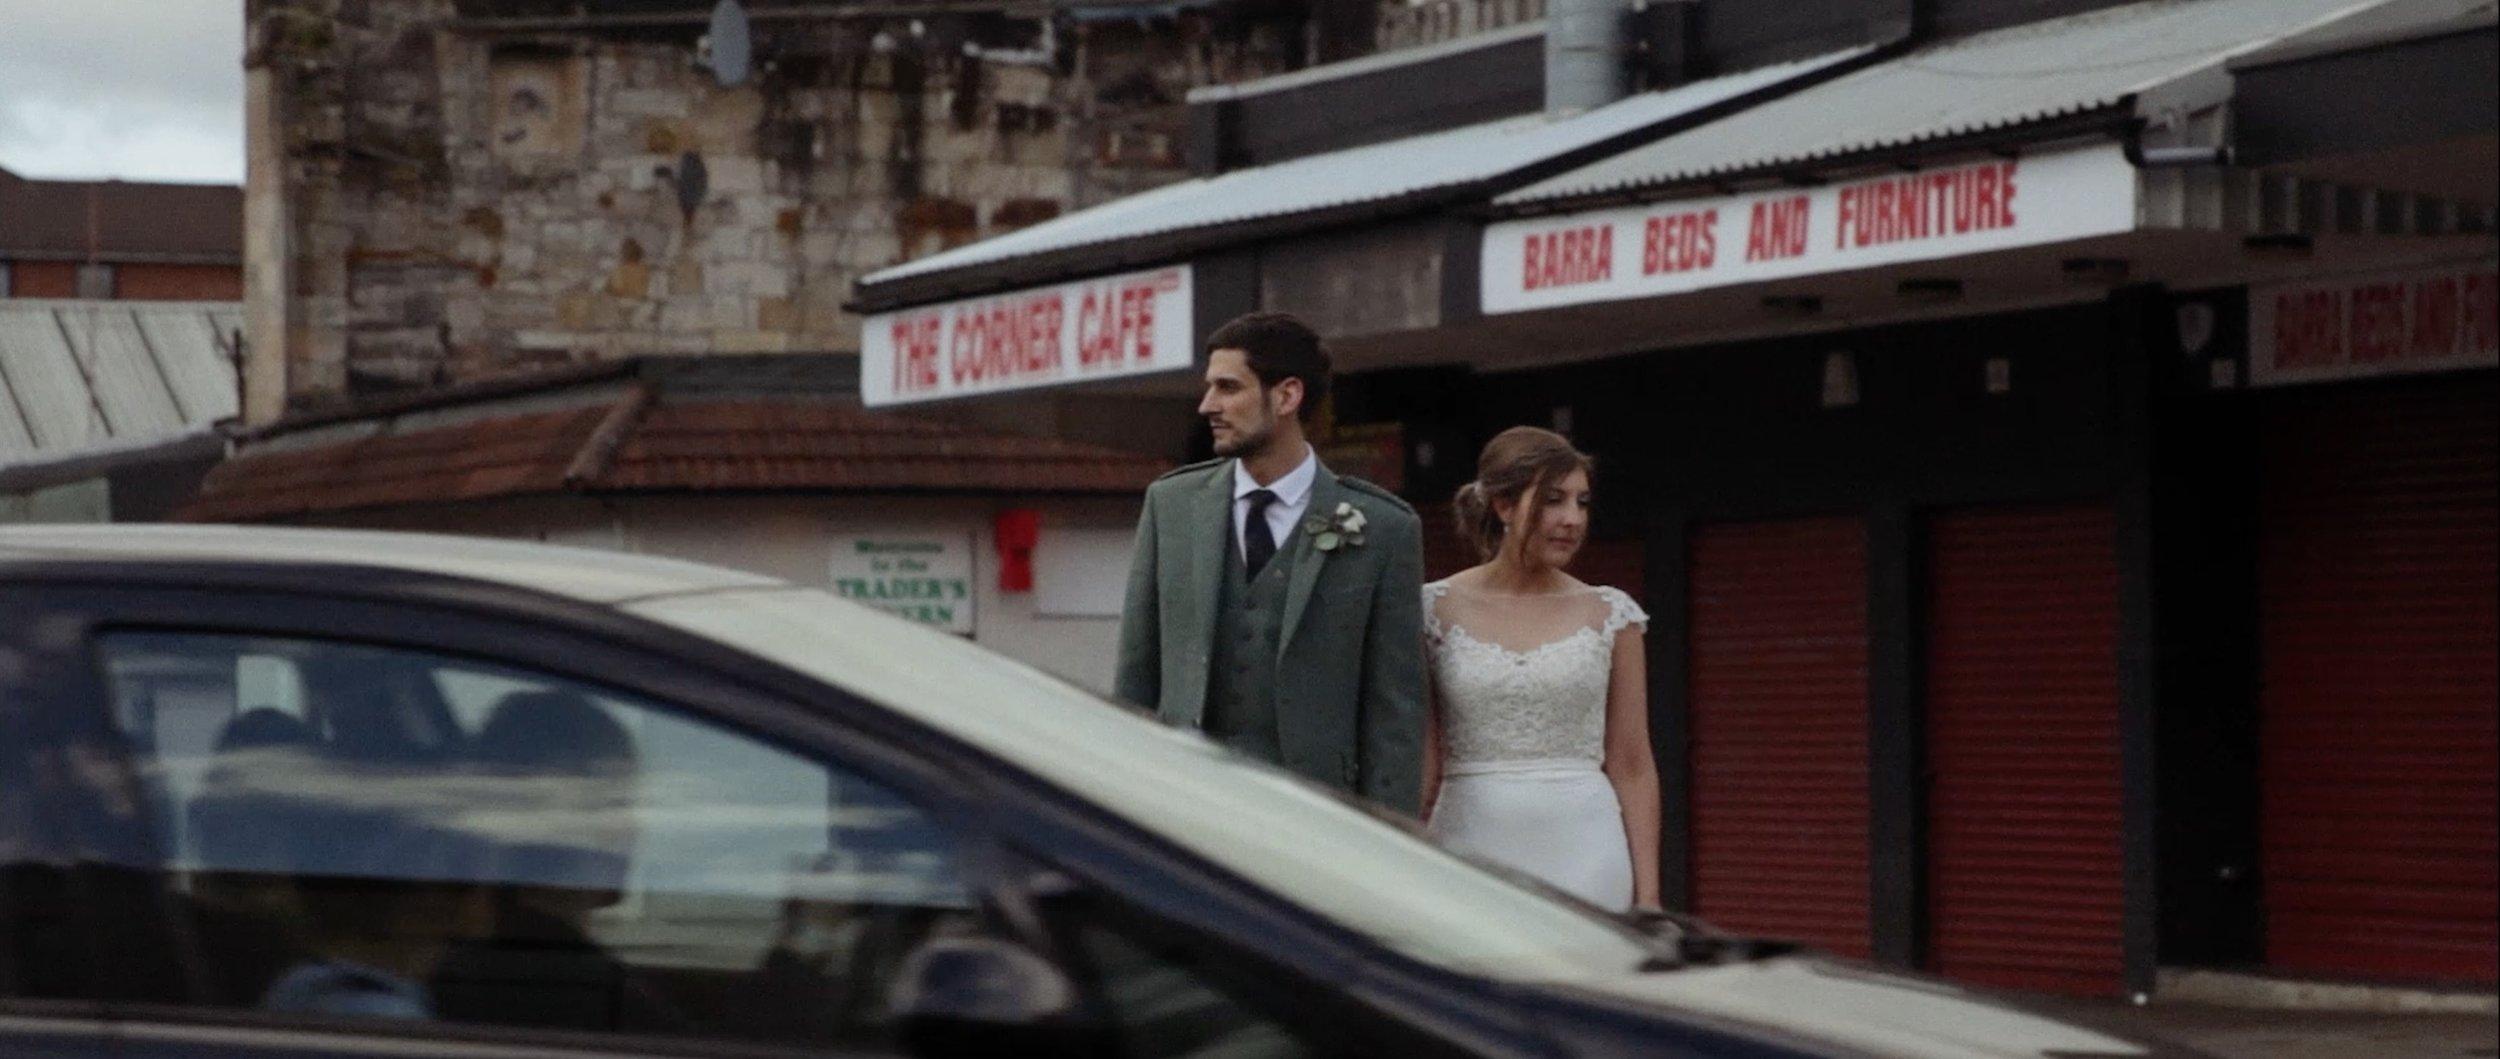 ayr-wedding-videographer_LL_05.jpg